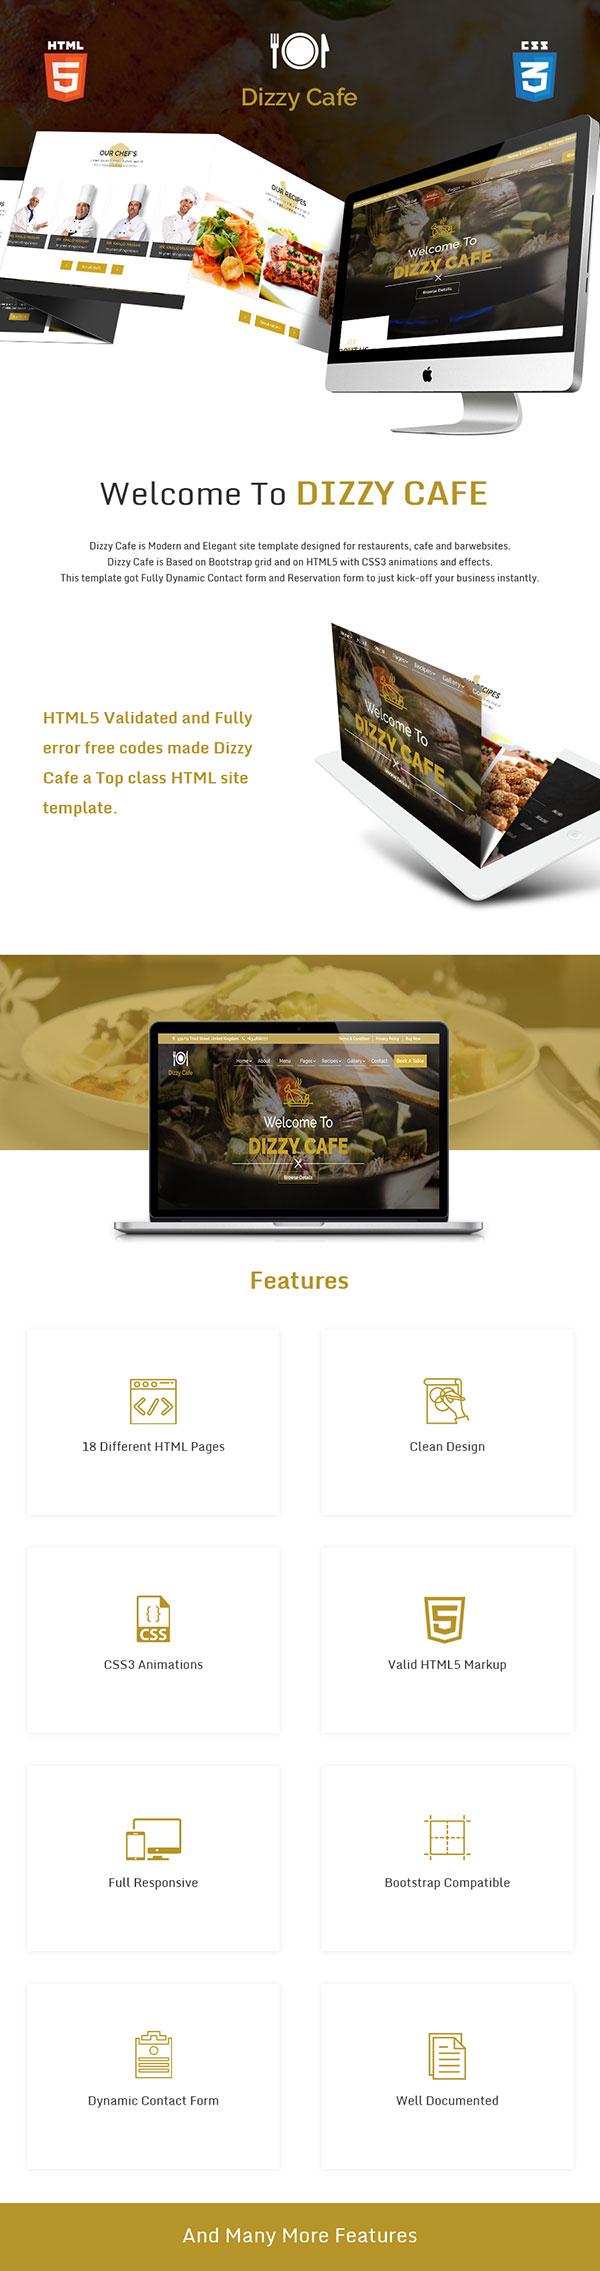 Dizzy Cafe - Responsive Restaurant/Cafe Site Template - 1